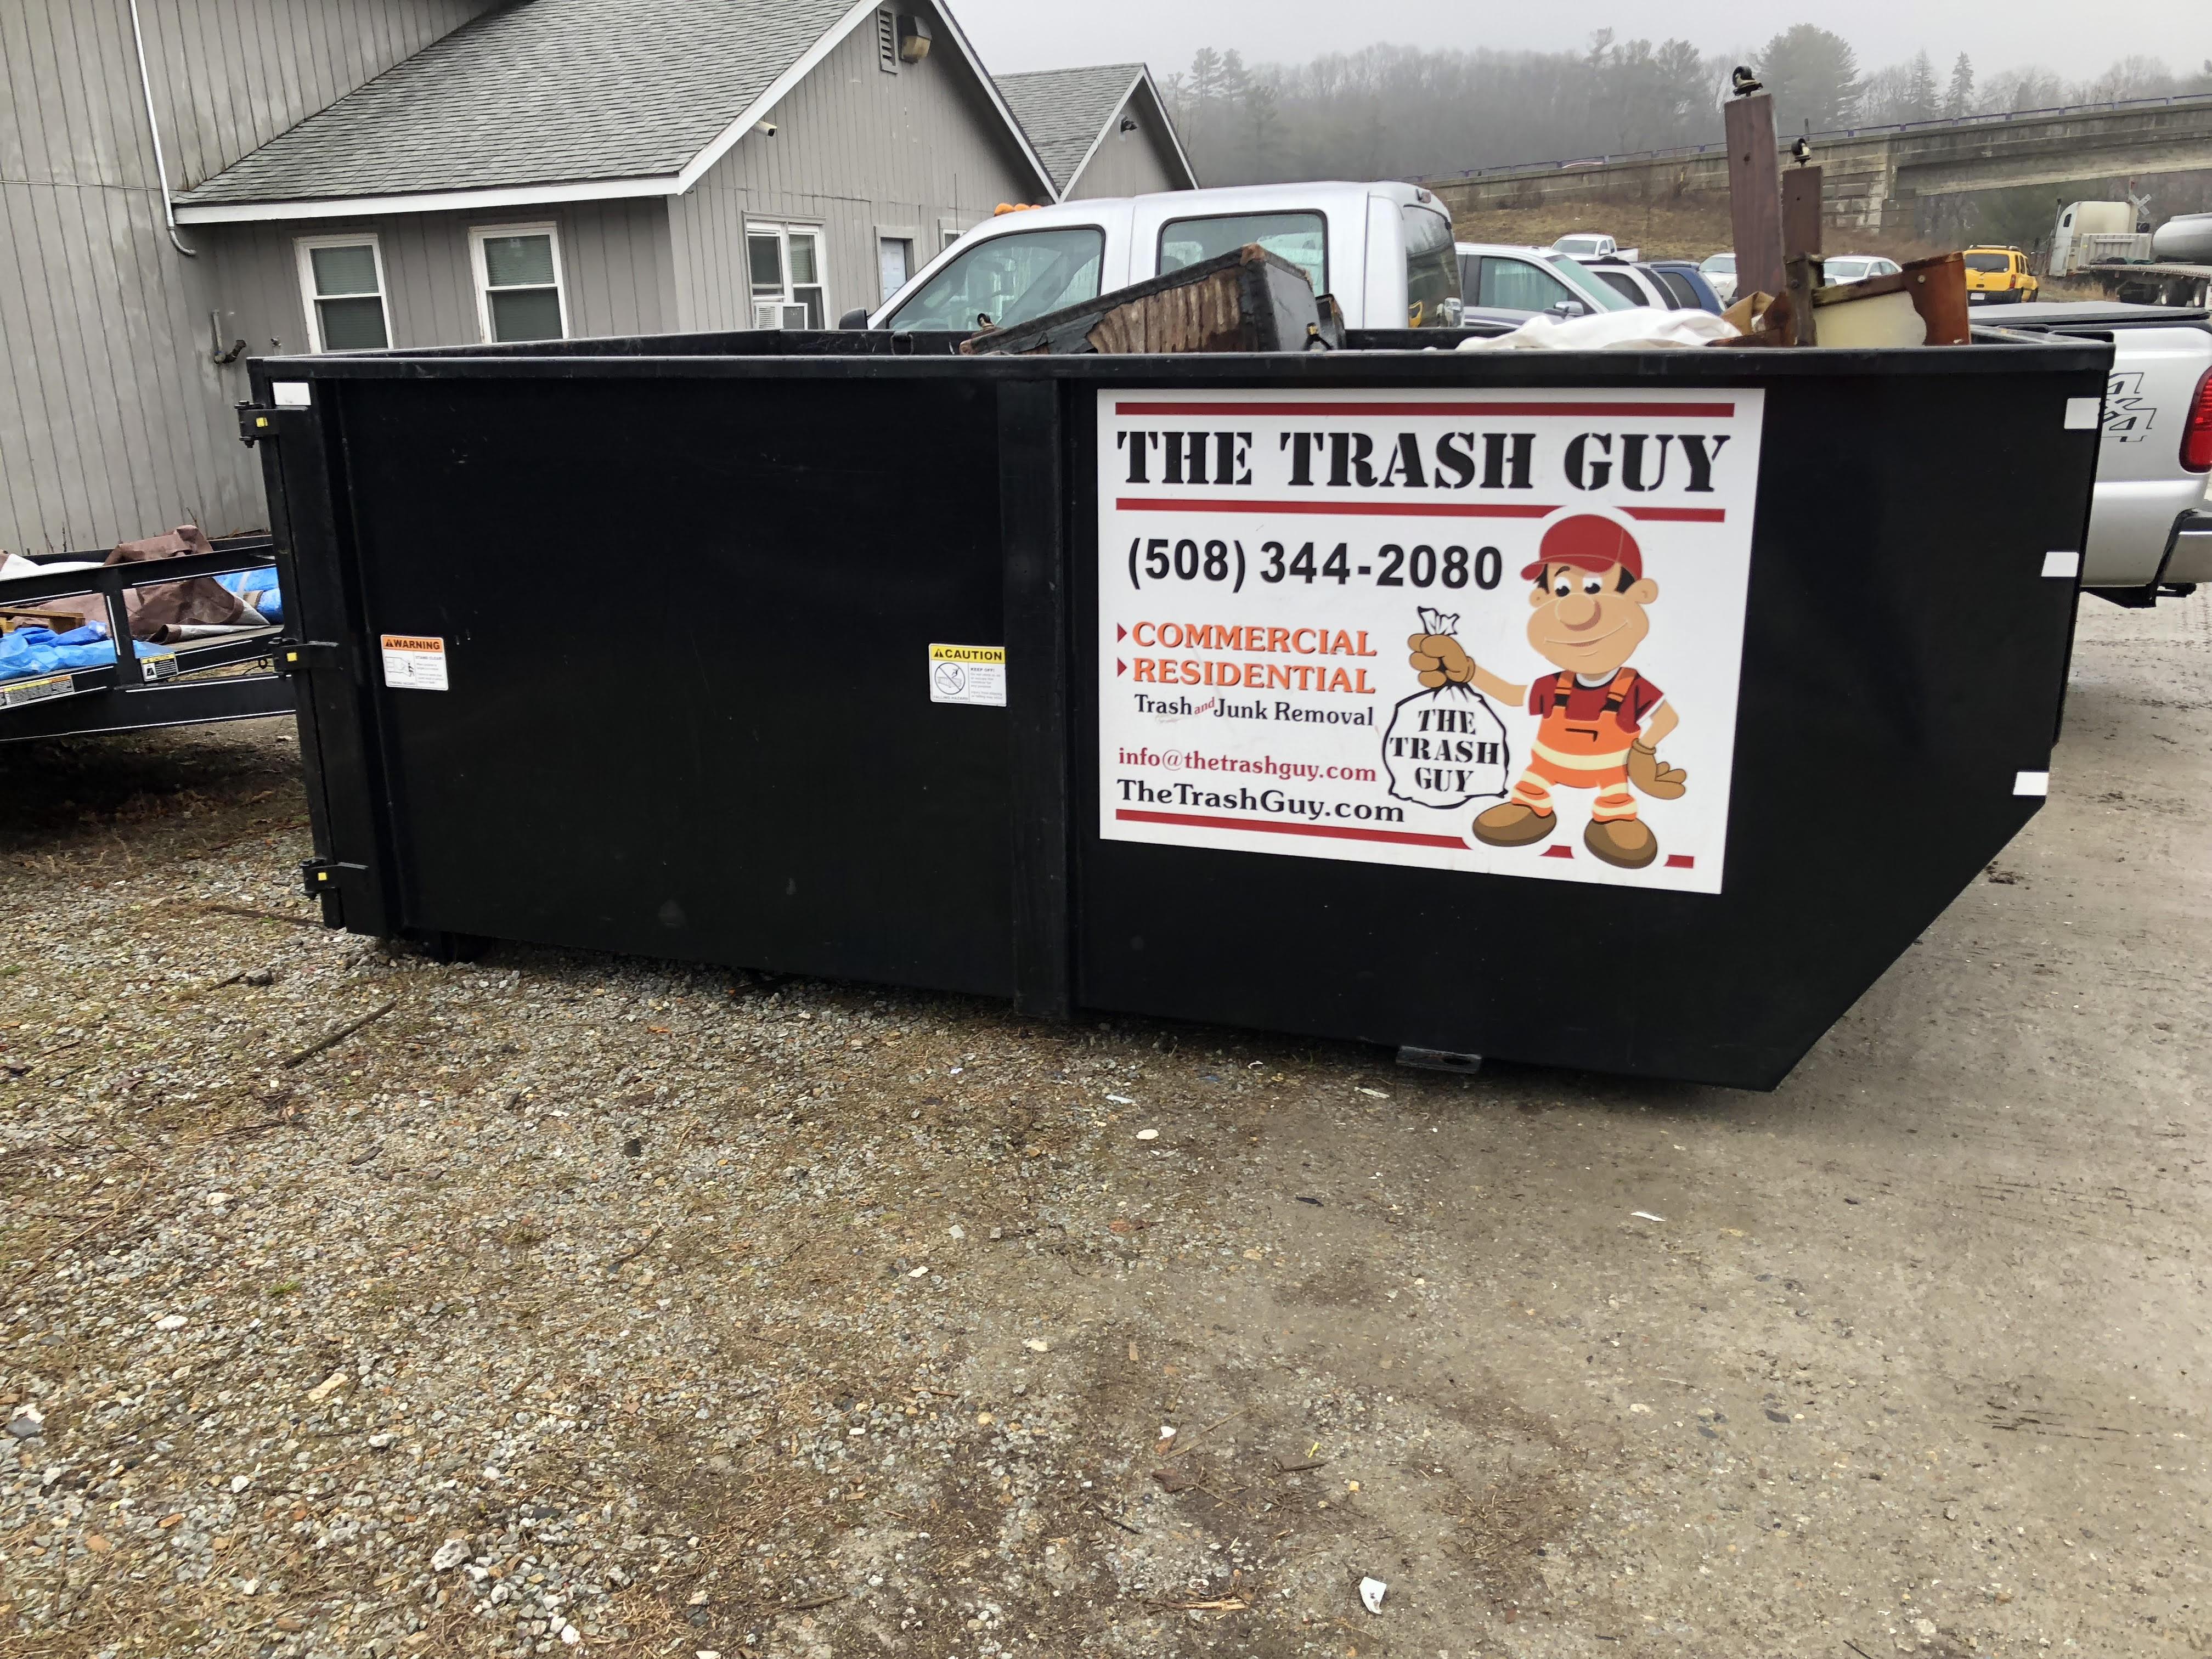 The Trash Guy